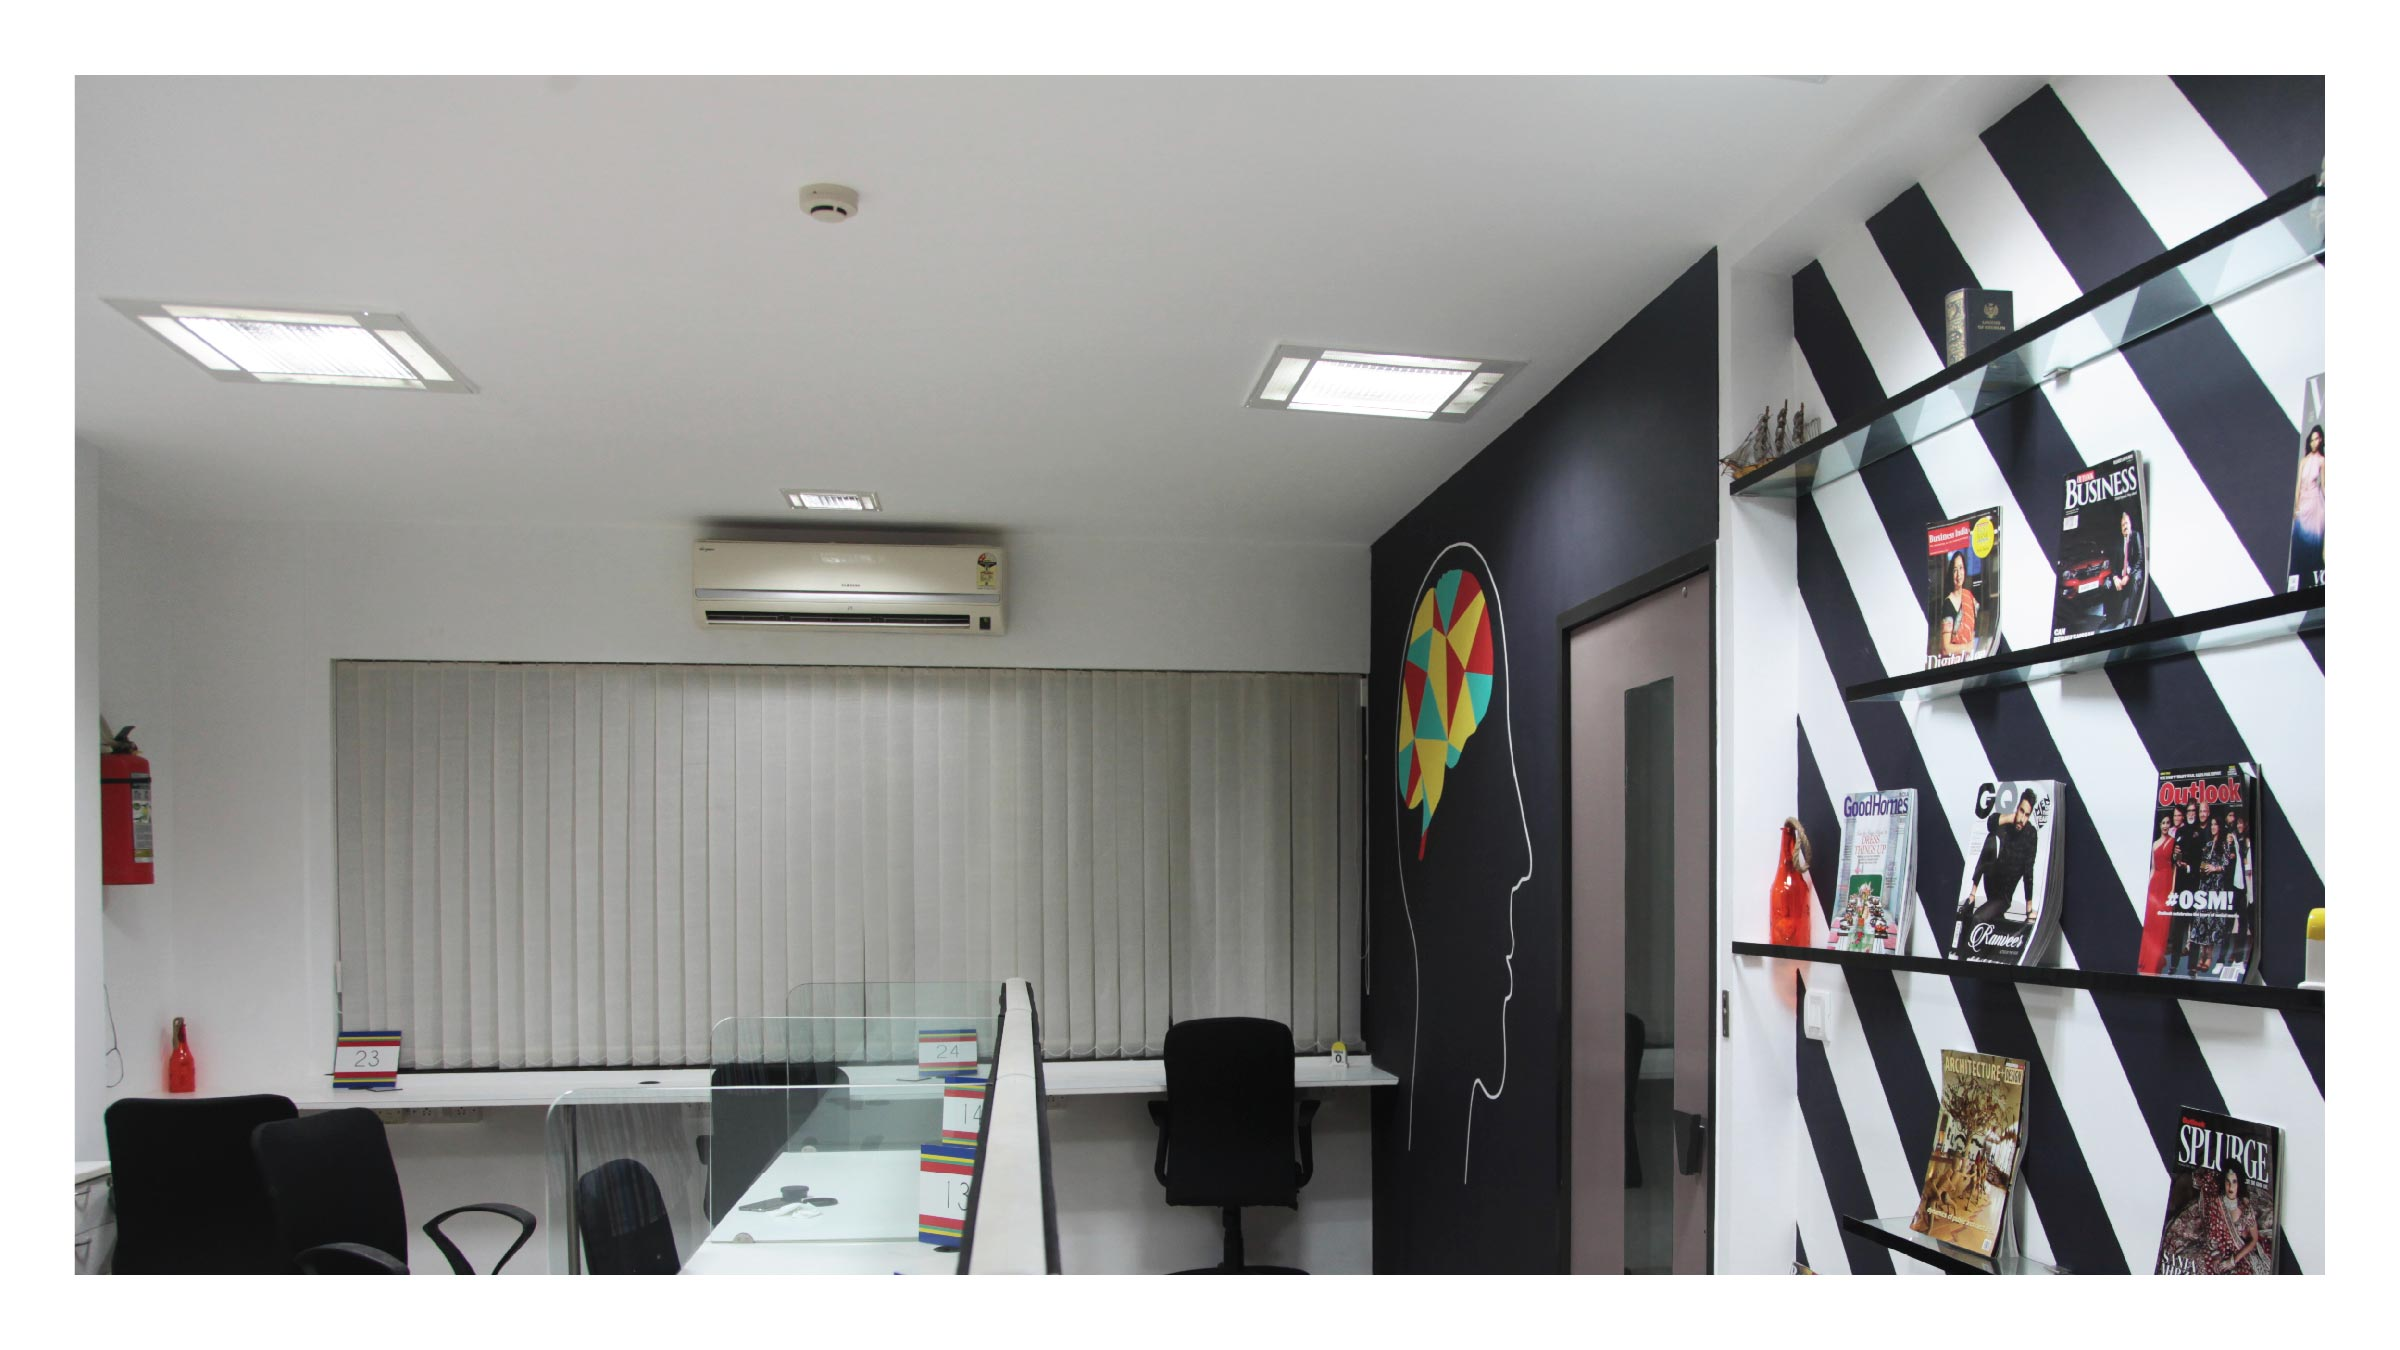 Vorq Space Andheri, Mumbai